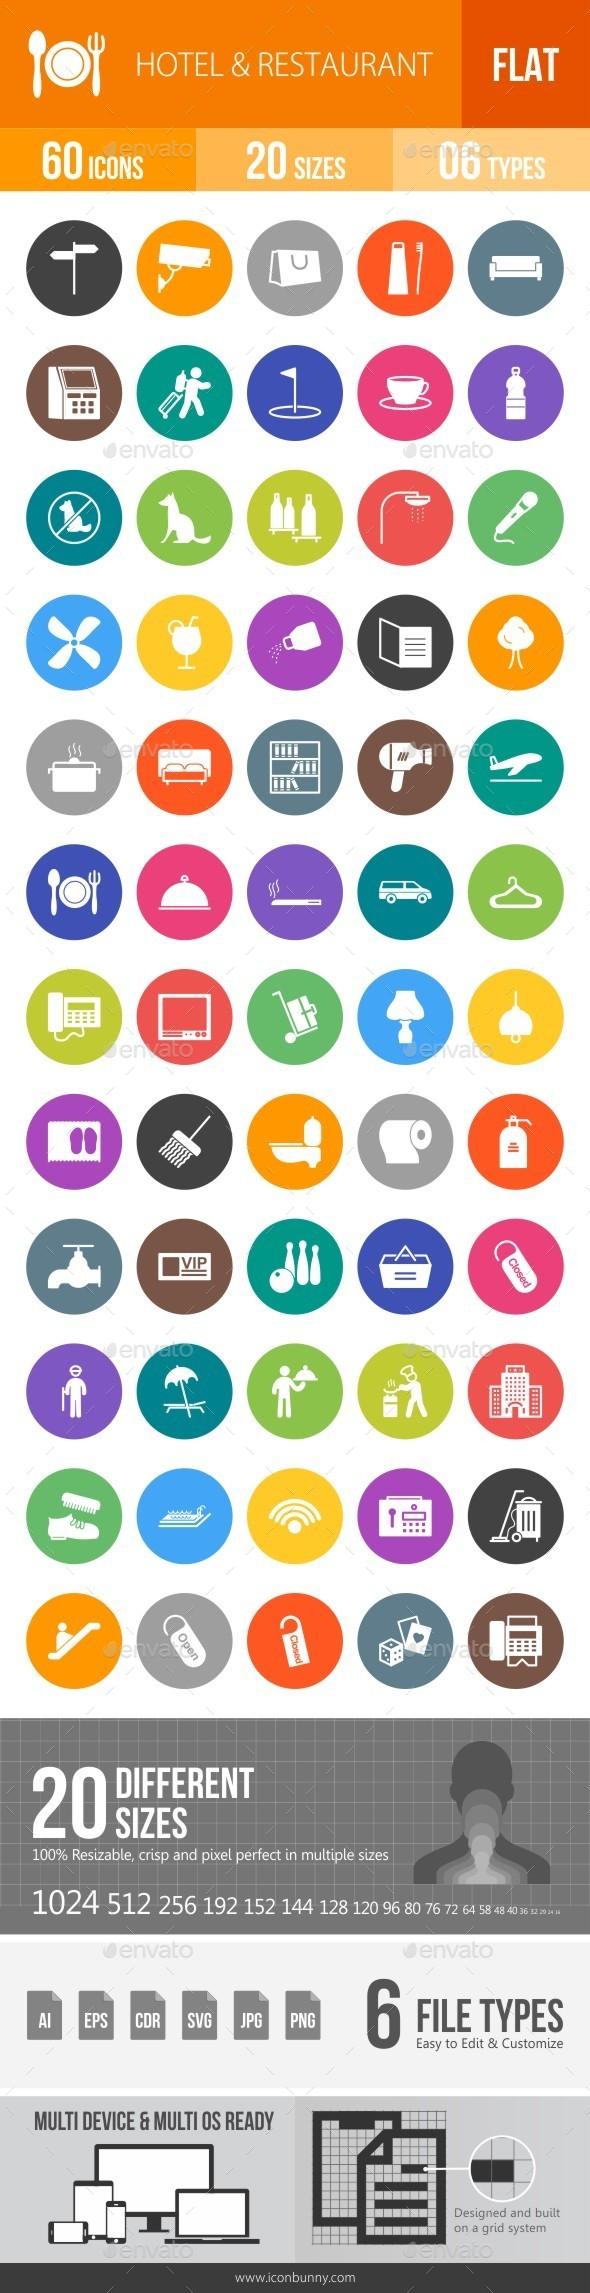 Hotel & Restaurant Flat Round Icons - Icons